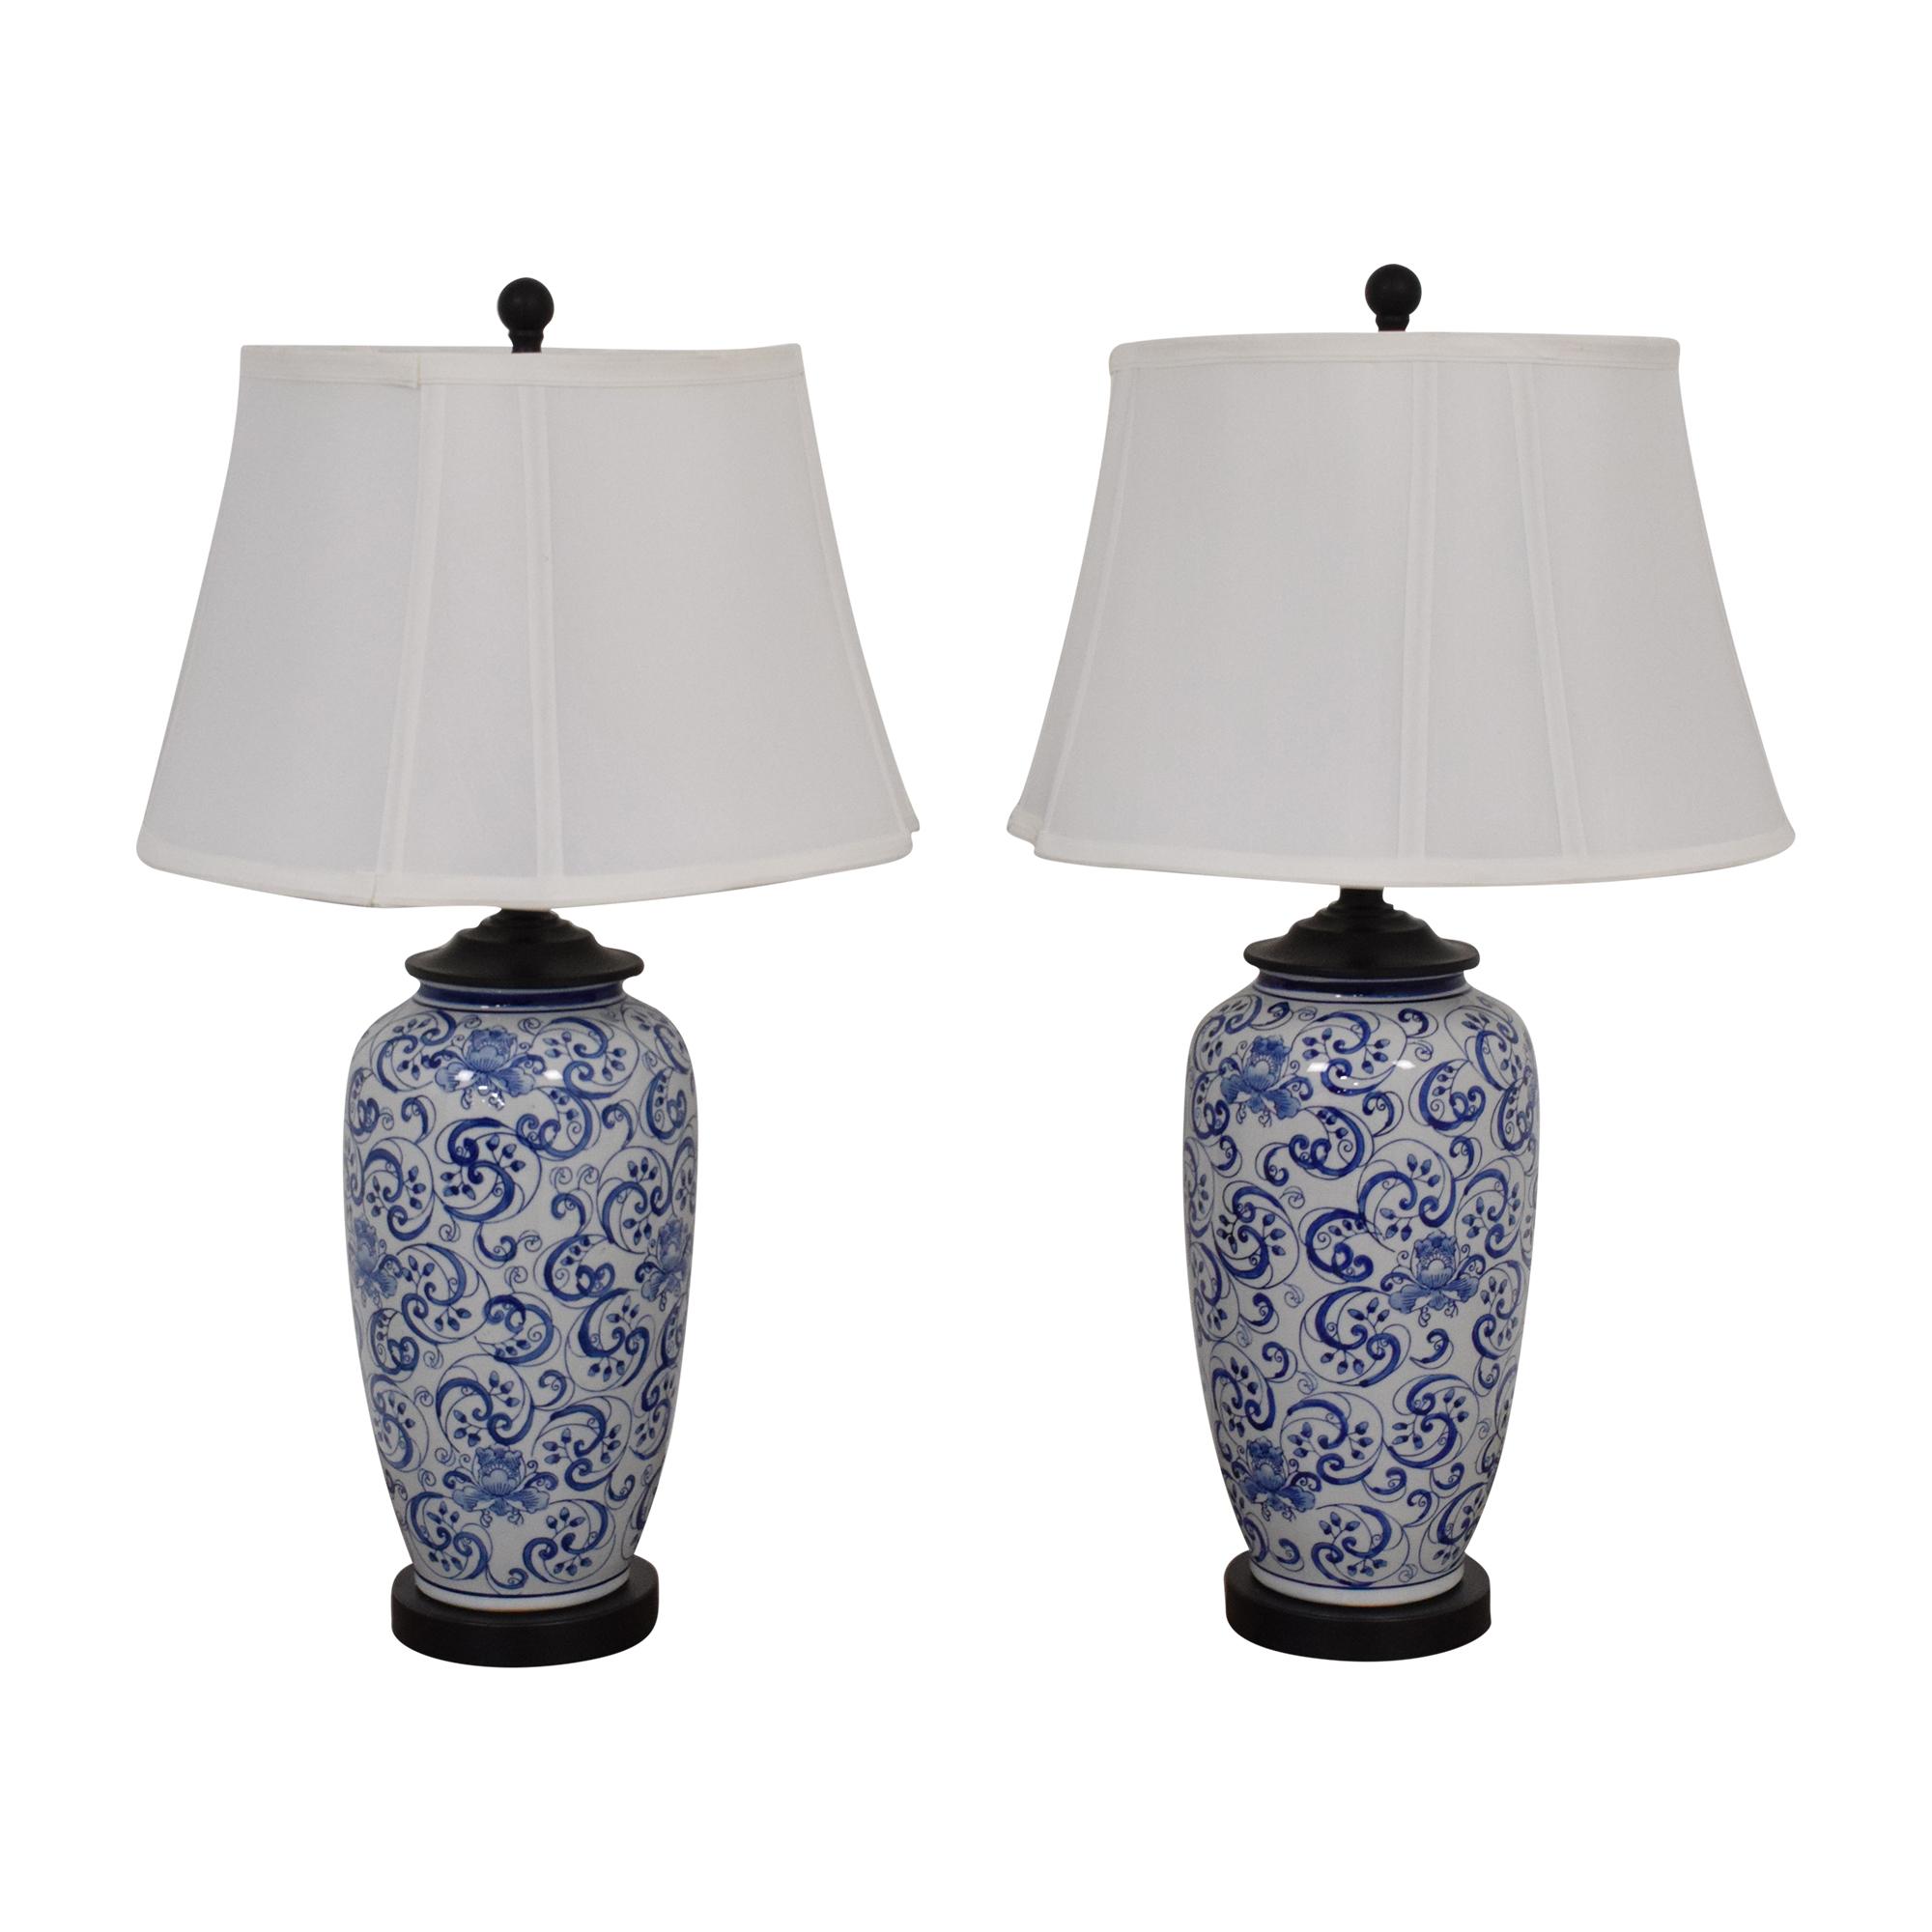 Decorative Table Lamps